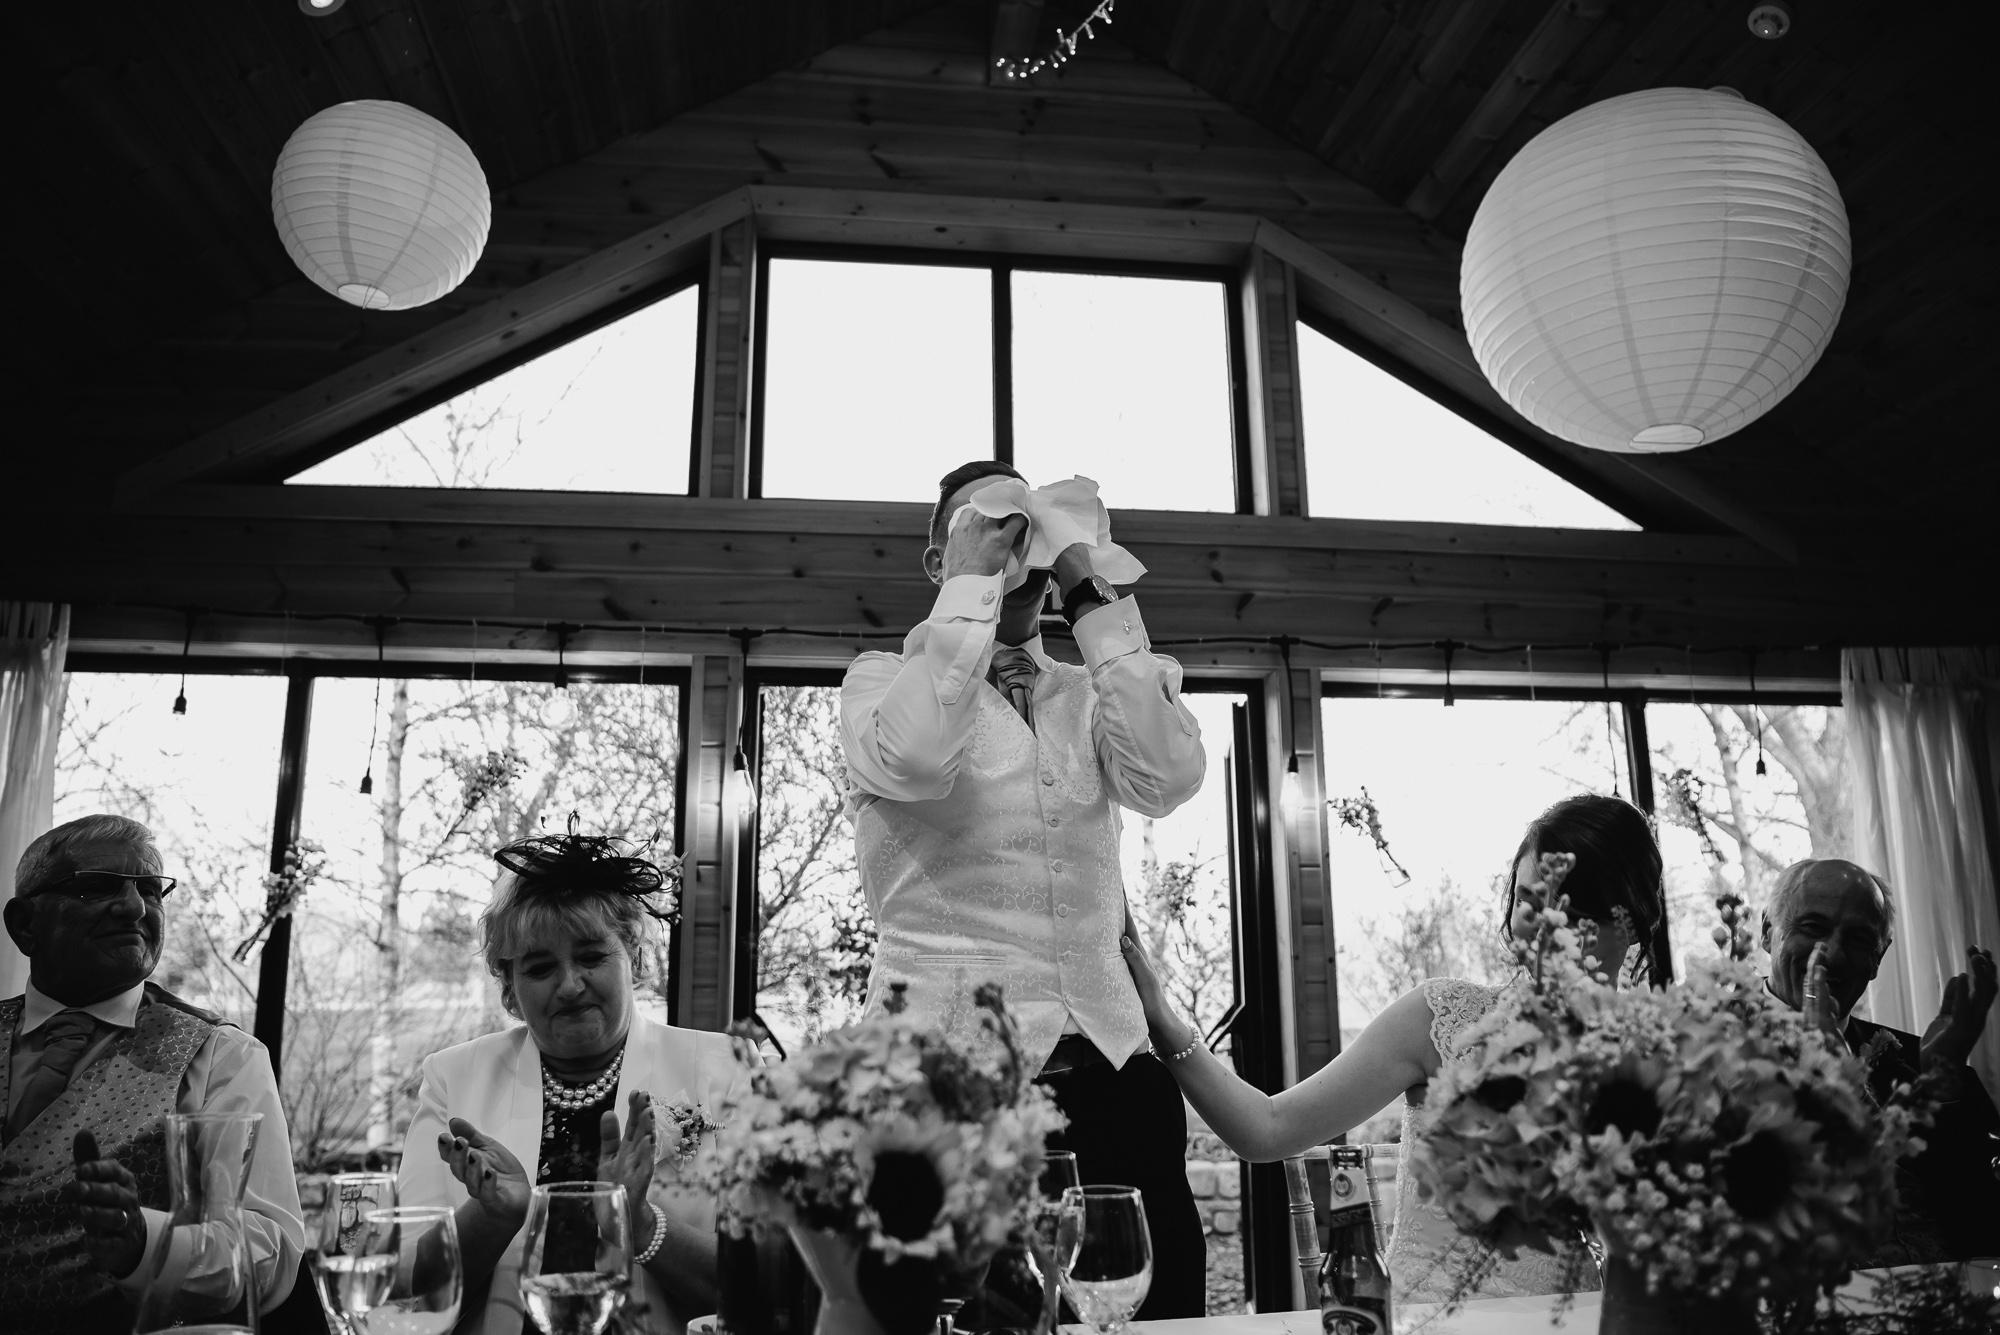 Beeston Manor Wedding Photographer based in cheshire covering Lancashire weddings and surounding areas of the northwest uk (2 of 6).jpg